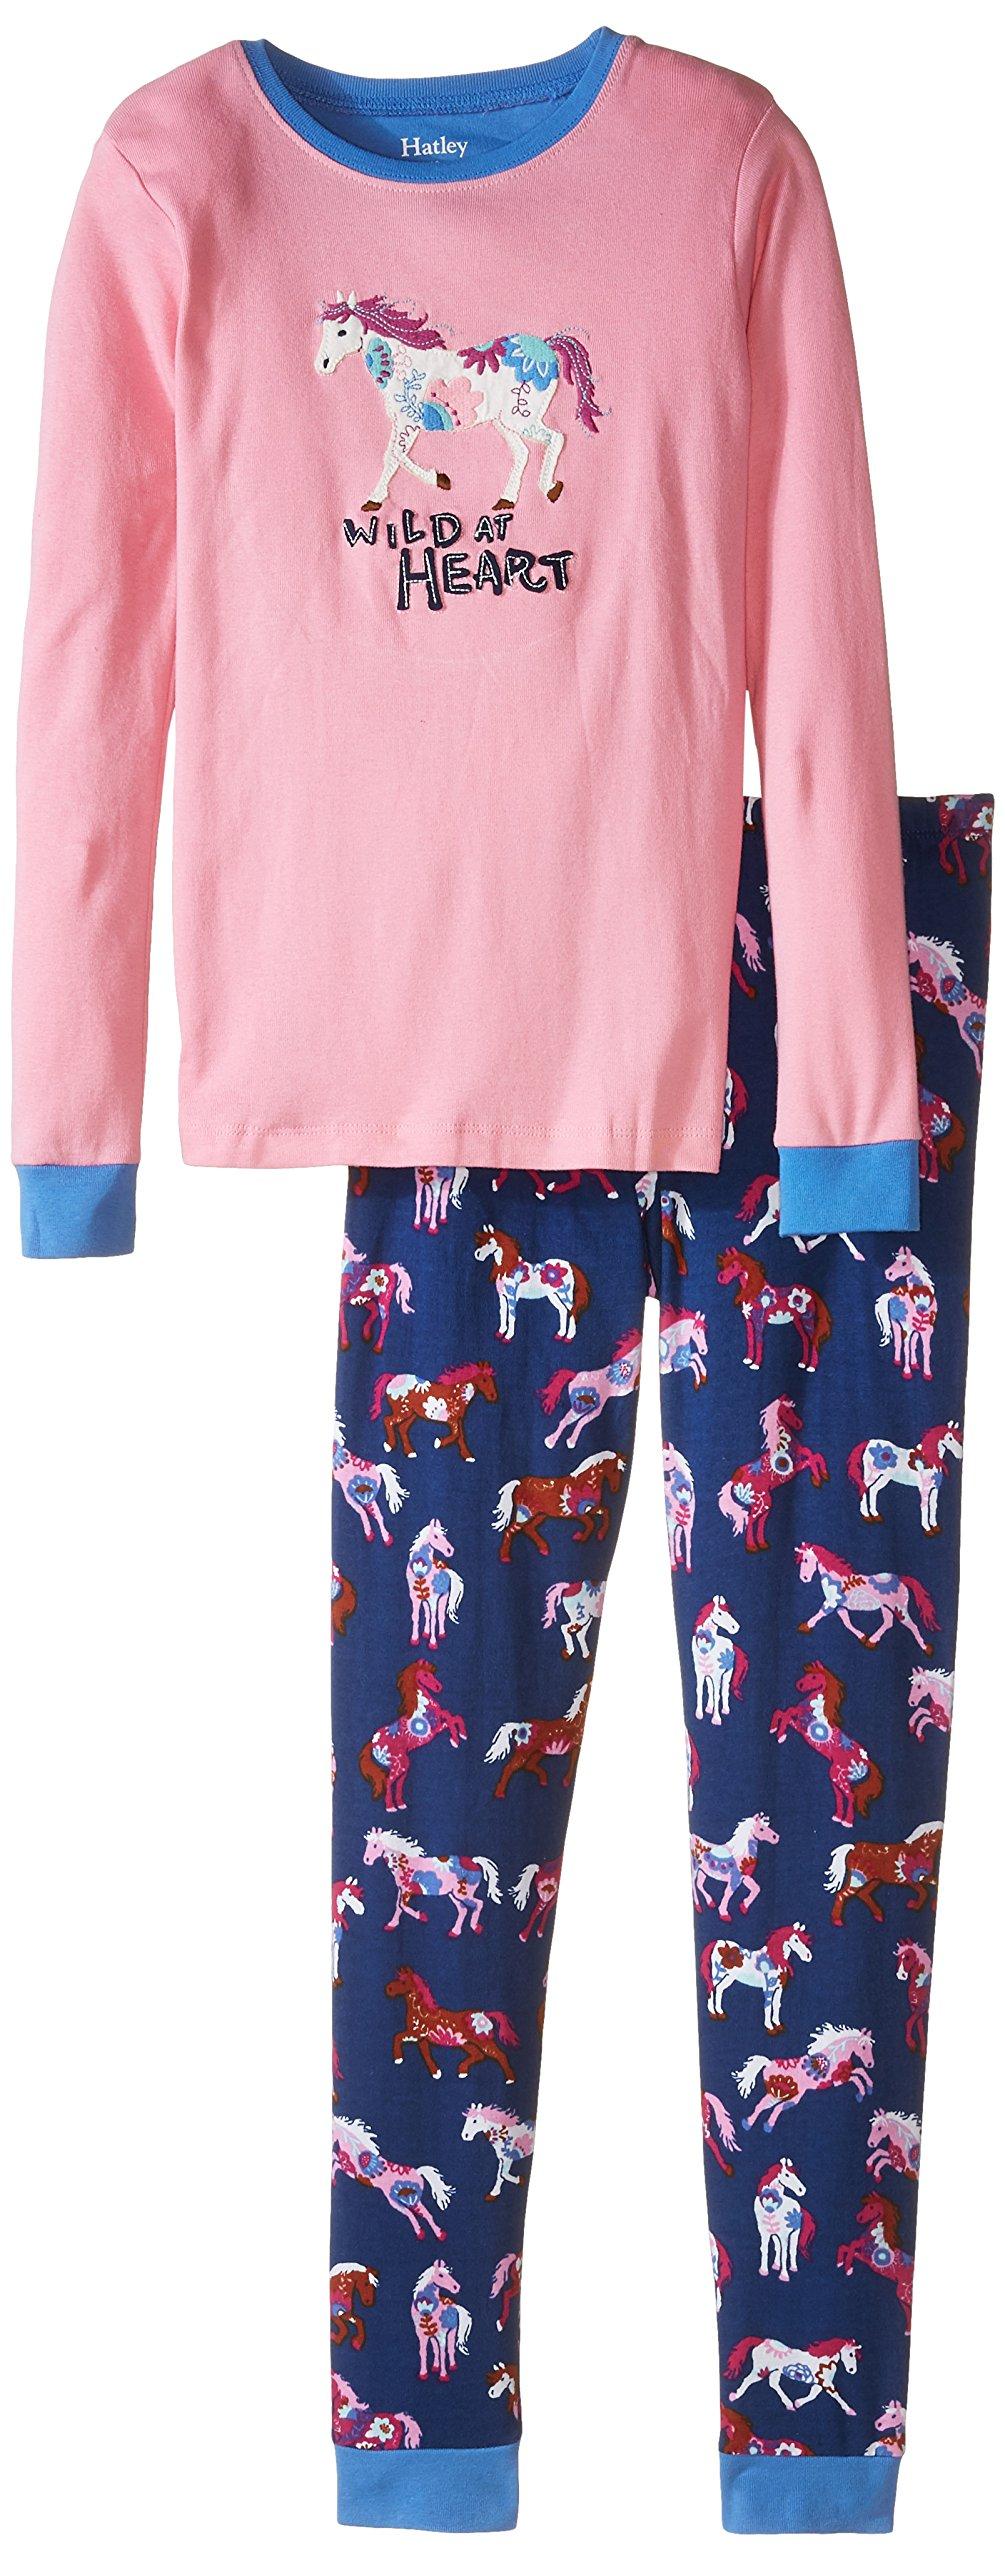 Hatley Little Girls' Pajama Set Applique - Flower Horses, Pink, 7